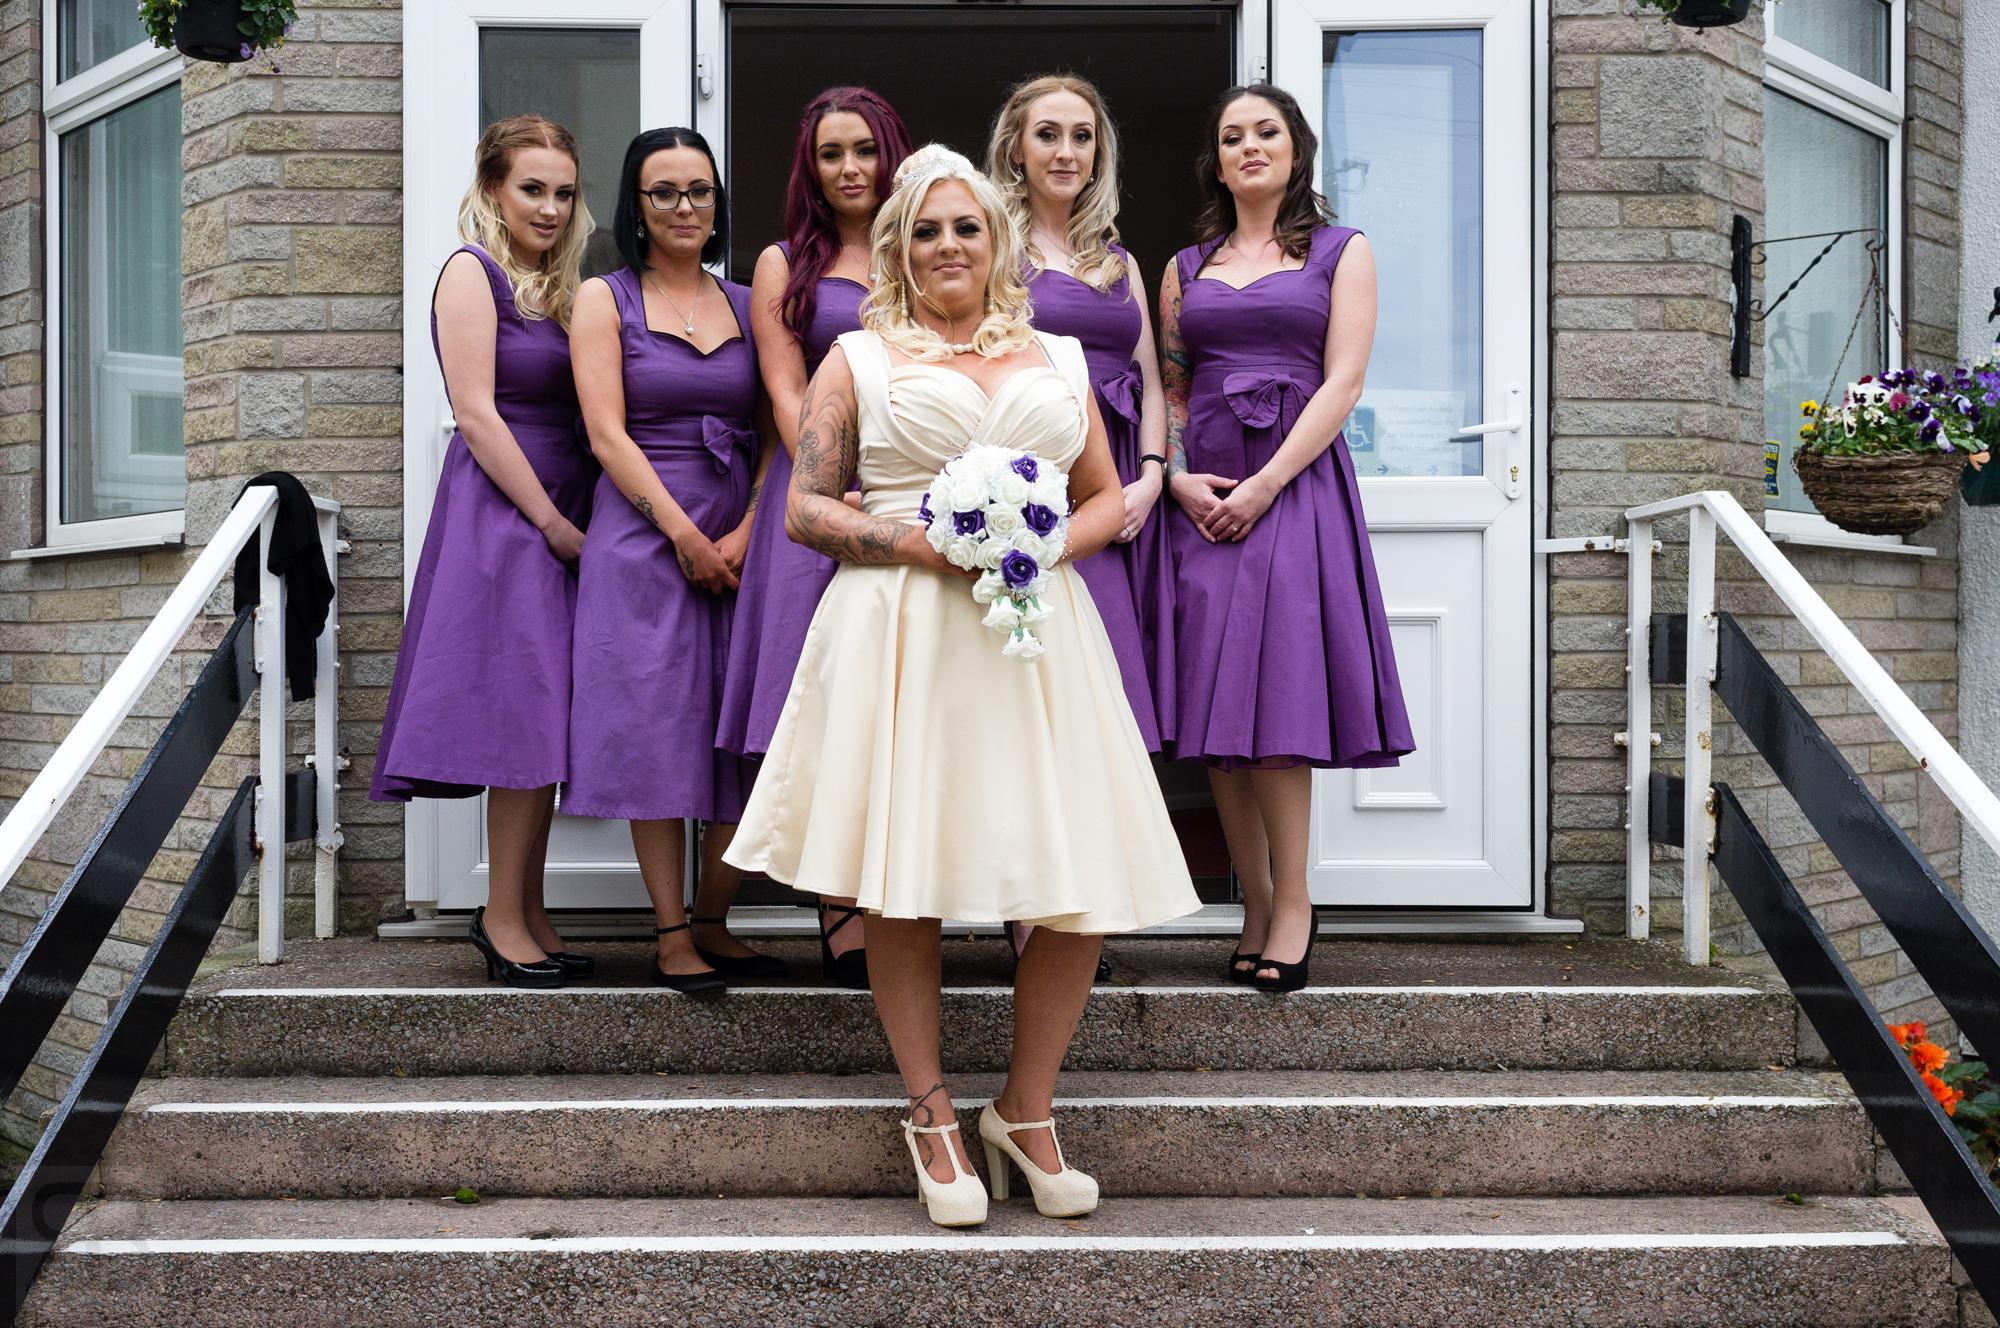 Ashley & Stacey Jones - Wedding OCT 2016